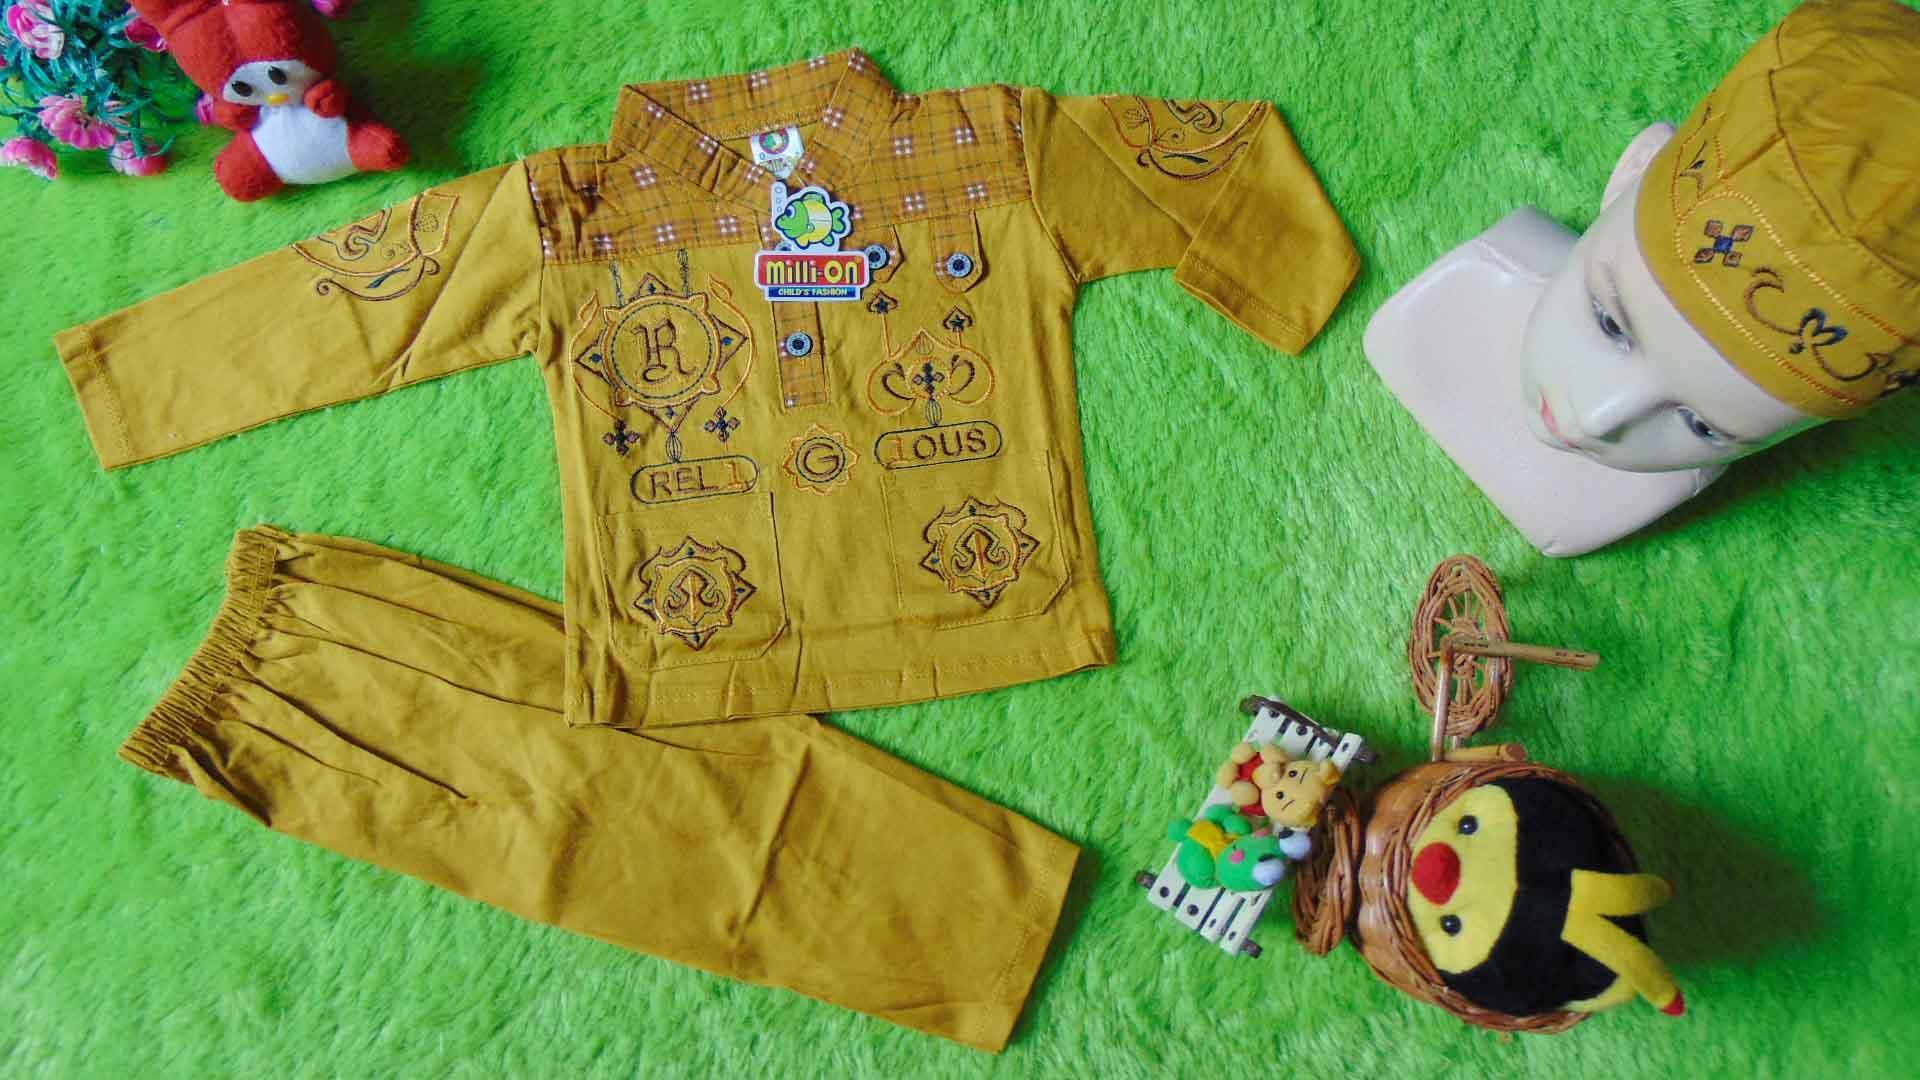 kembarshop - PLUS PECI setelan baju koko muslim anak bayi laki-laki newborn 0-12bulan kuning kunyit bordir kancing dada